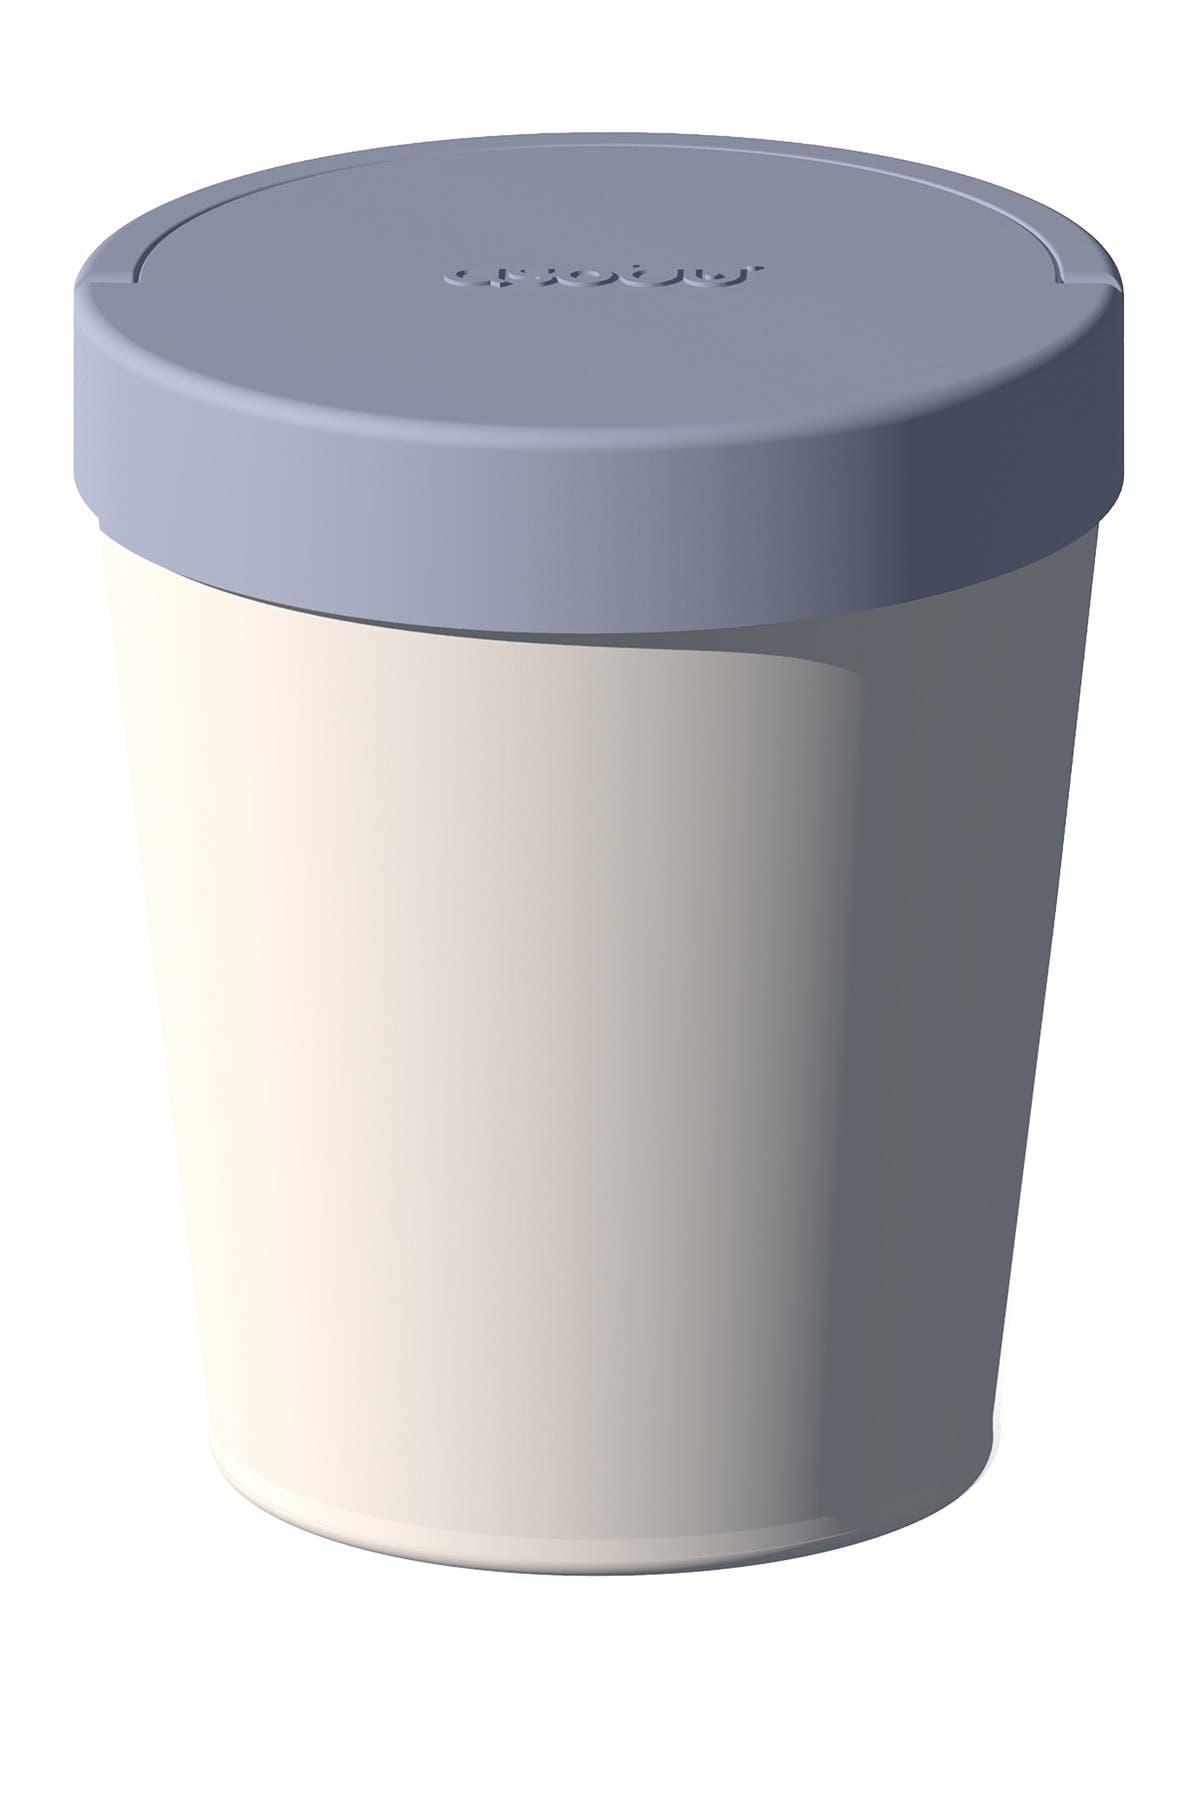 Image of ASOBU Ice Cream Cold Pint Keeper - White